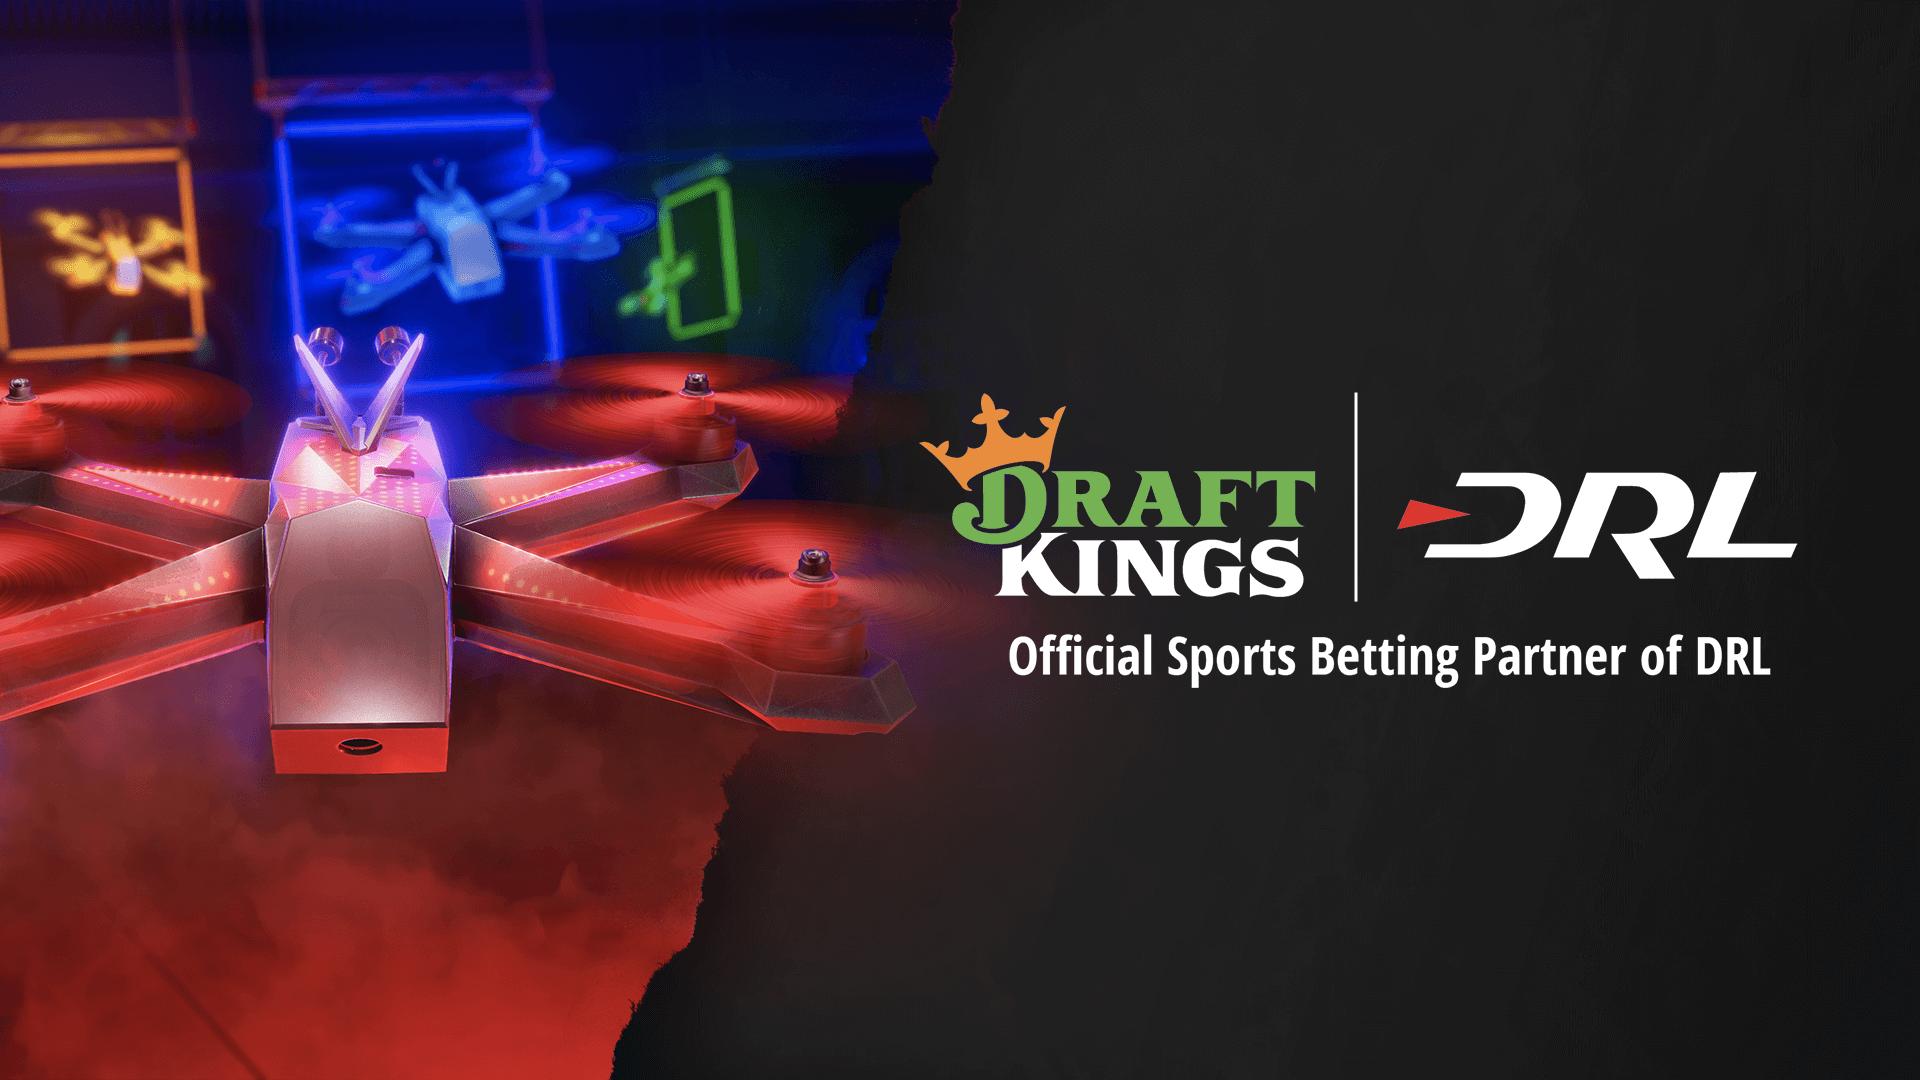 Most Engaging Sports Betting Partnership